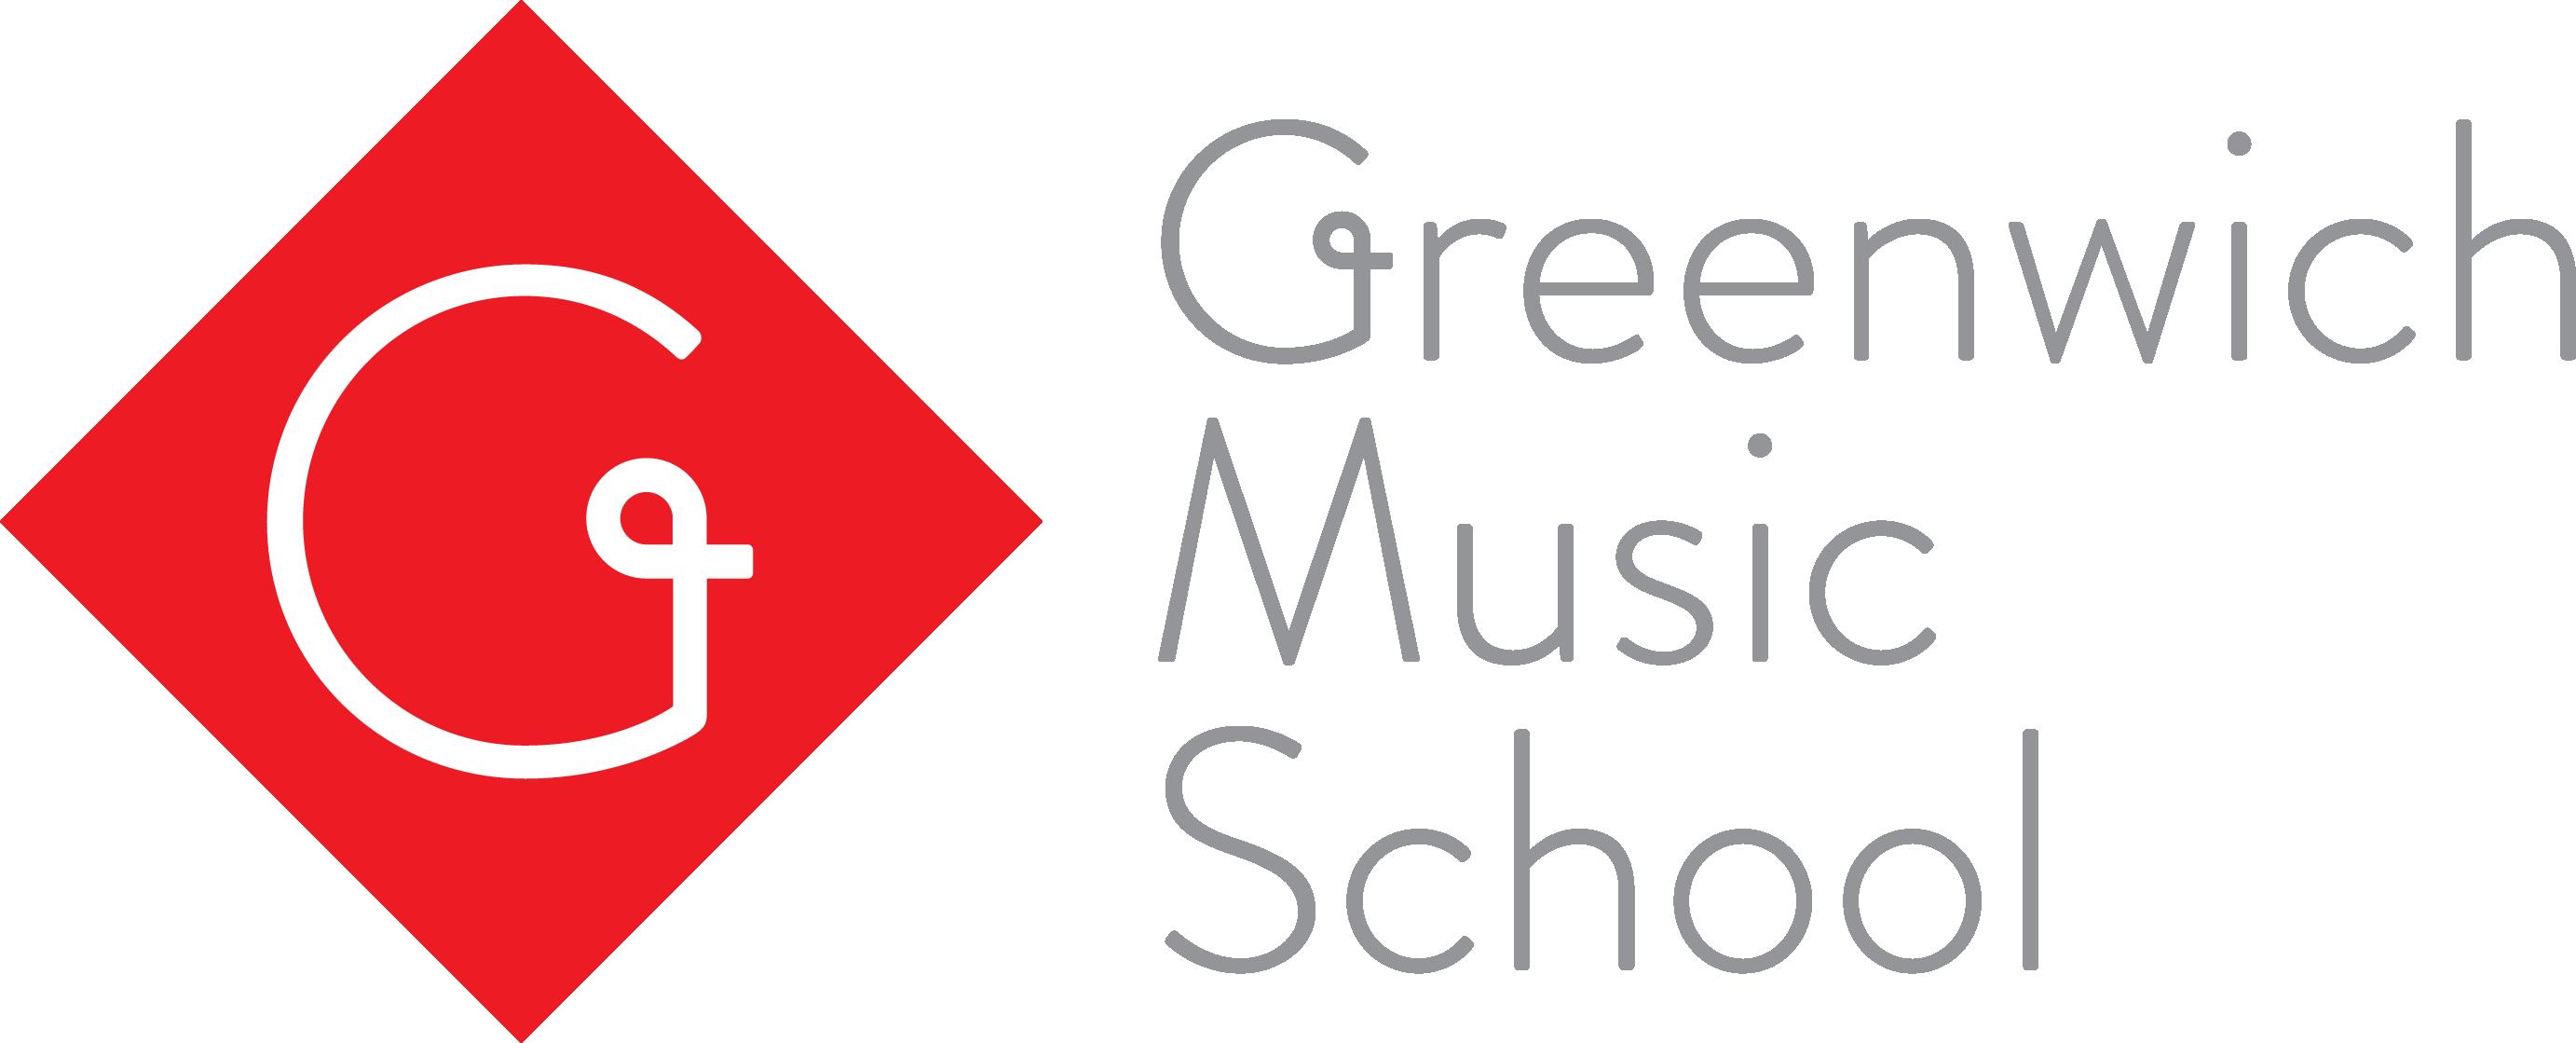 Greenwich Music School